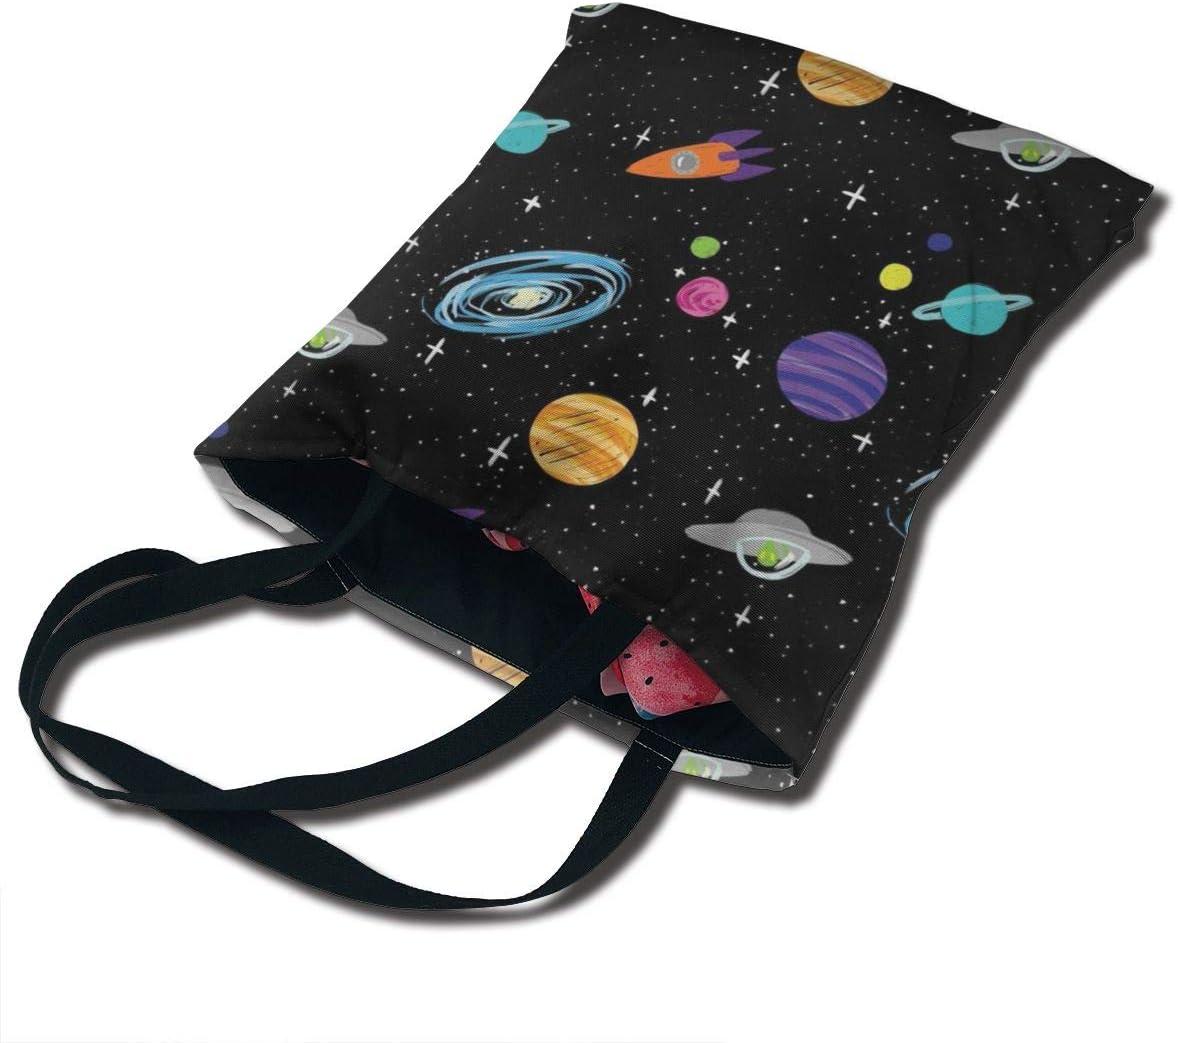 PengMin Space Fashion Womens Multi-Pocket Vintage Canvas Handbags Miniature Shoulder Bags Totes Purses Shopping Bags